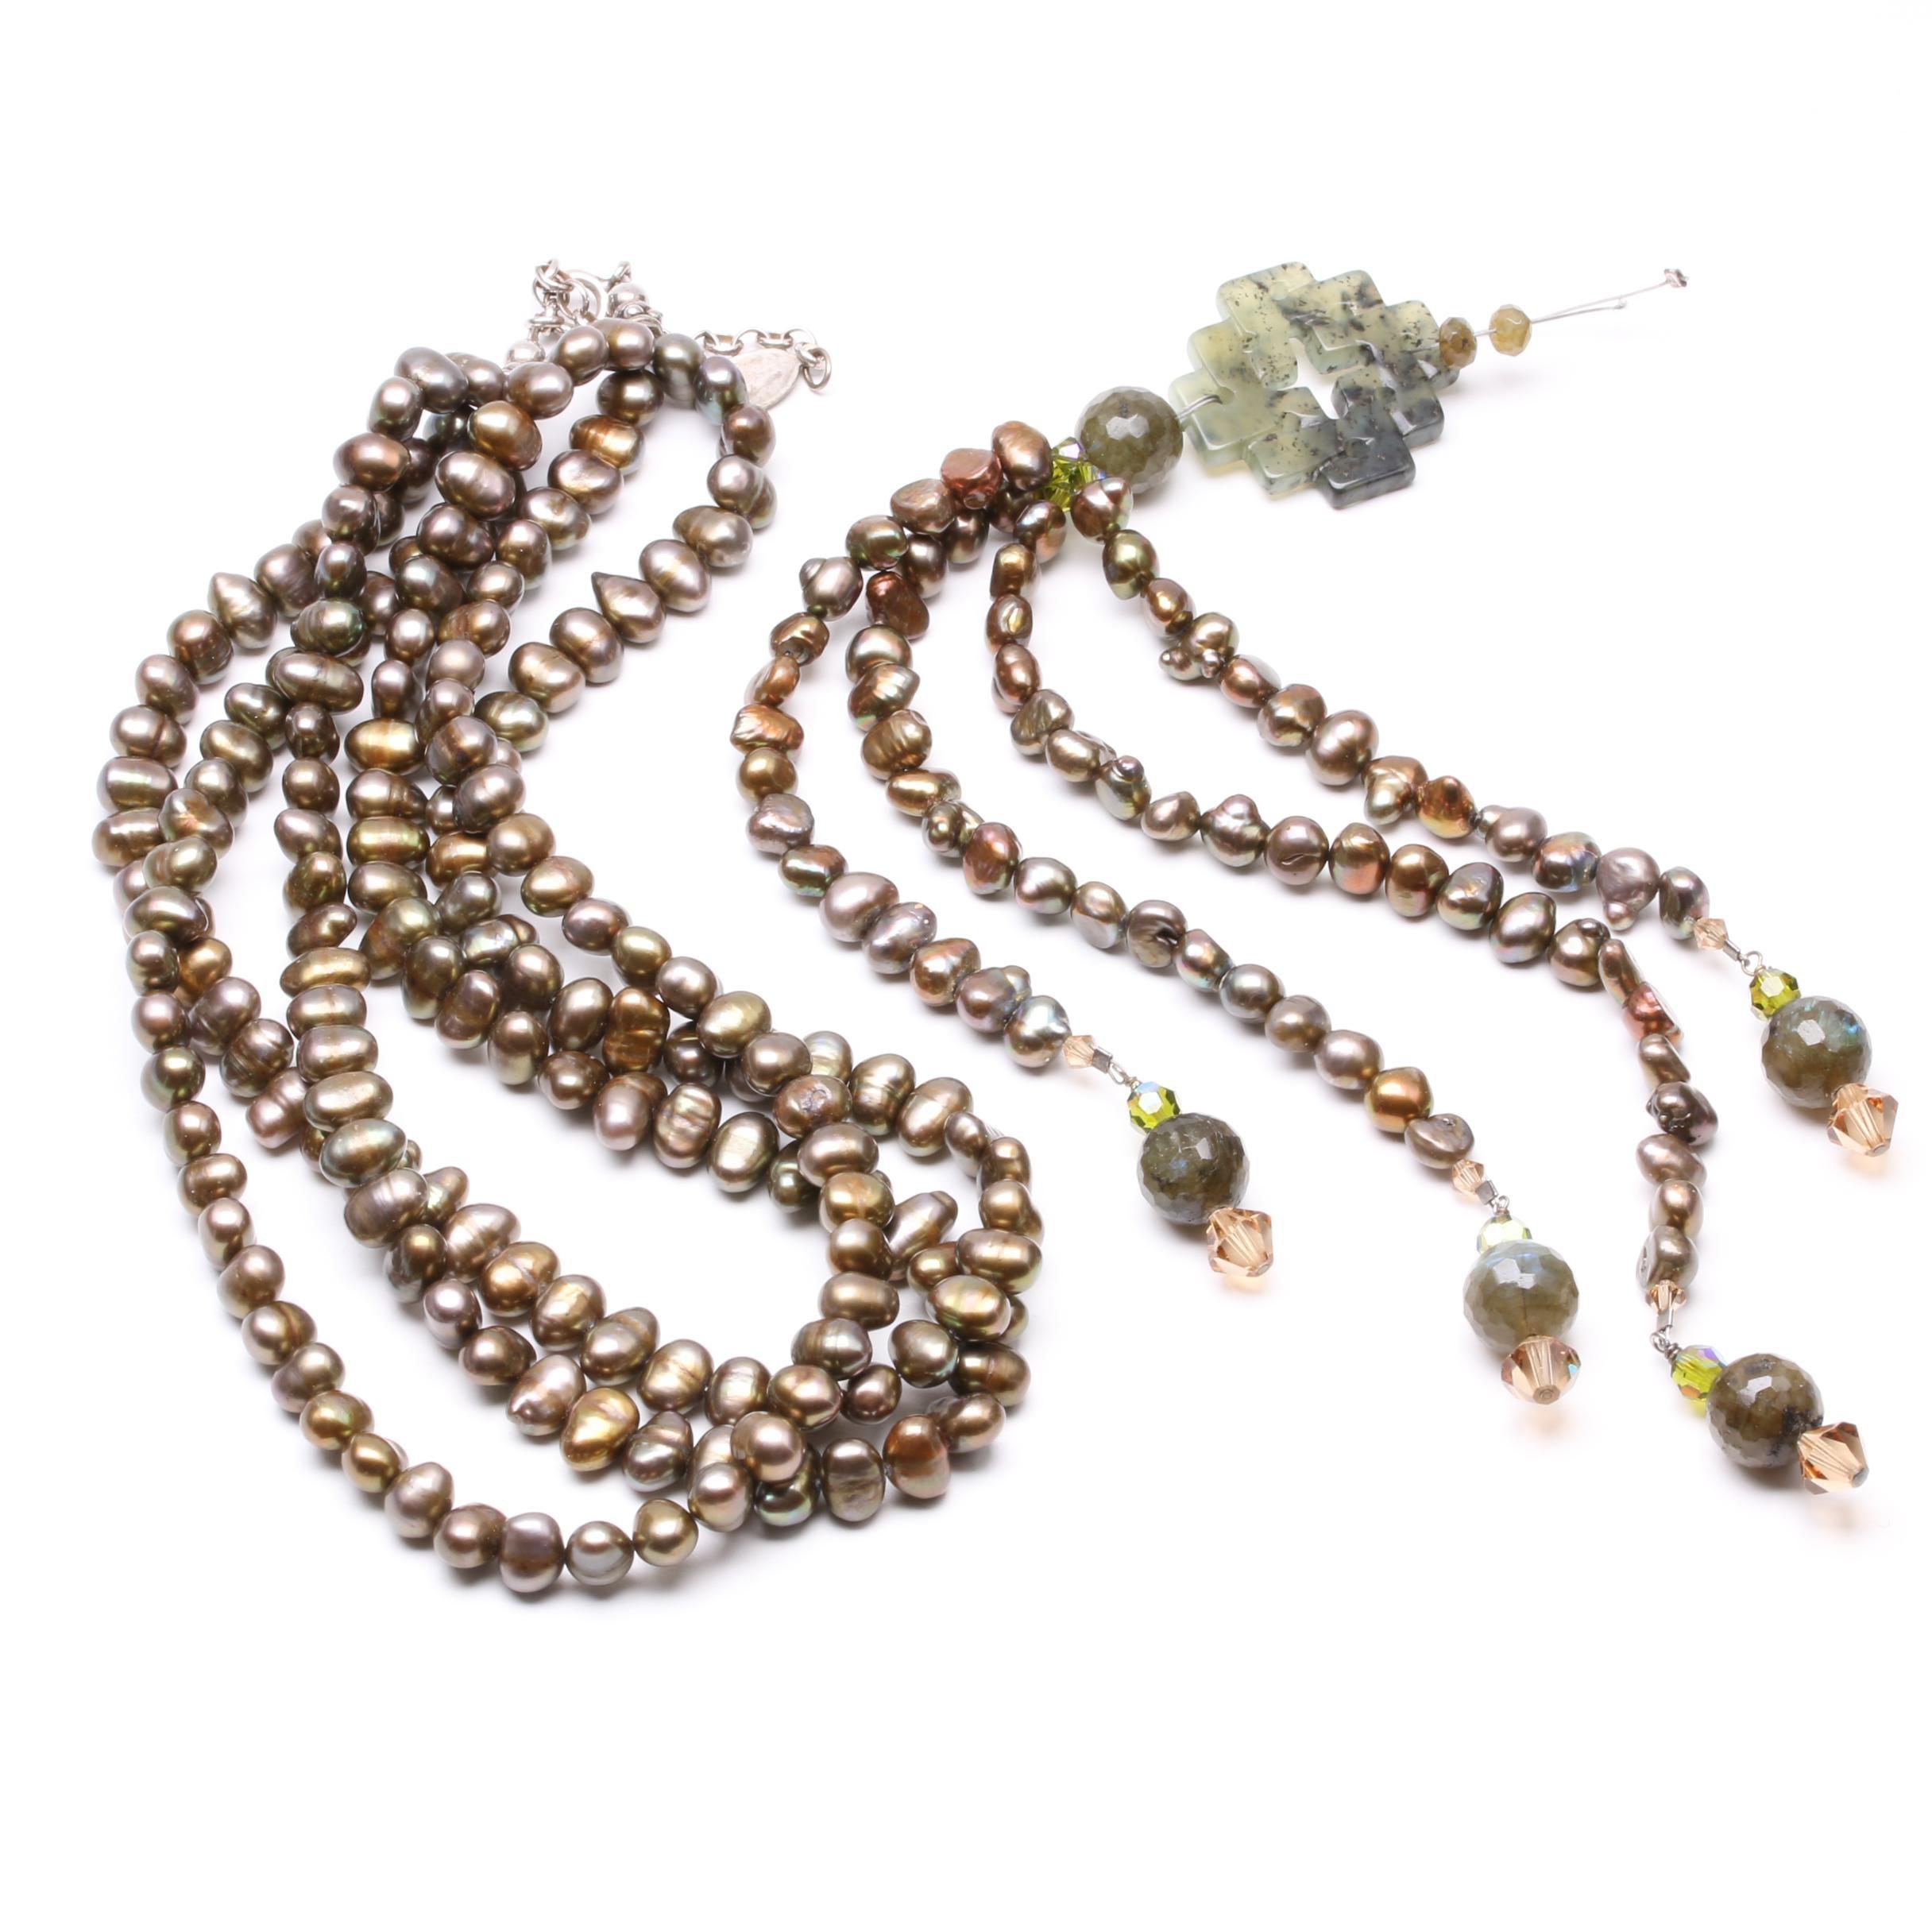 Bejewel by Carroll Dorsey Walker Sterling Silver Sautoire Pearl Necklace